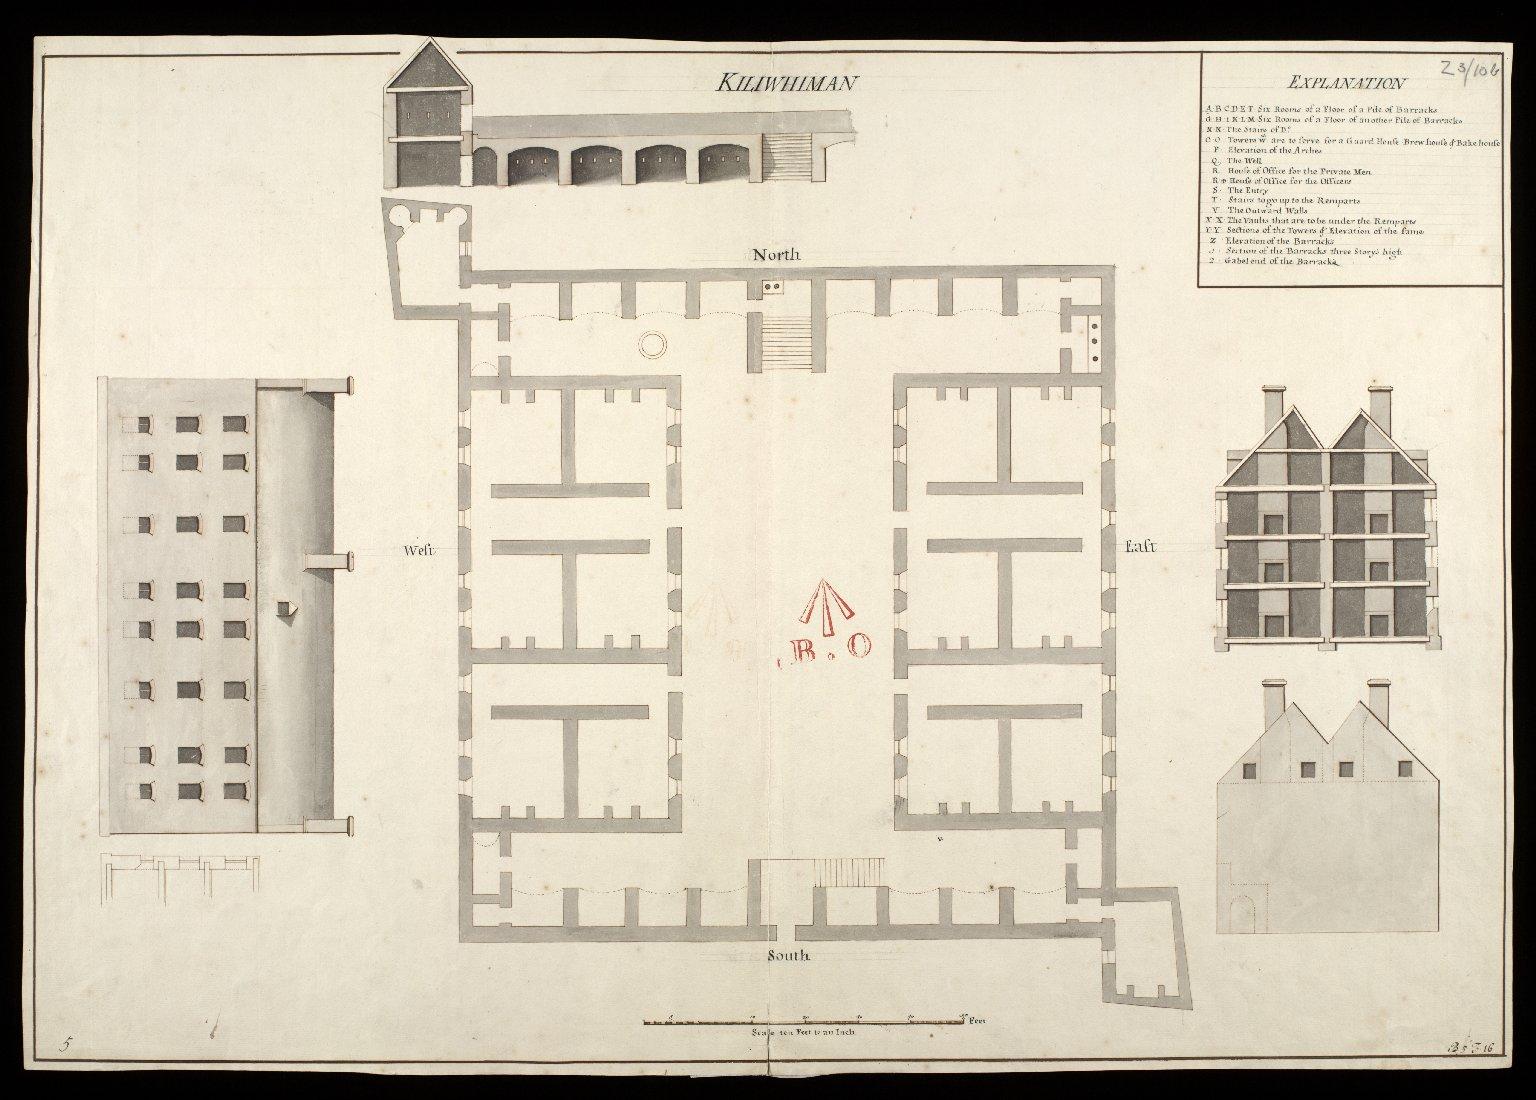 Kiliwhiman [i.e. Kiliwhimen] [1719] [1 of 1]